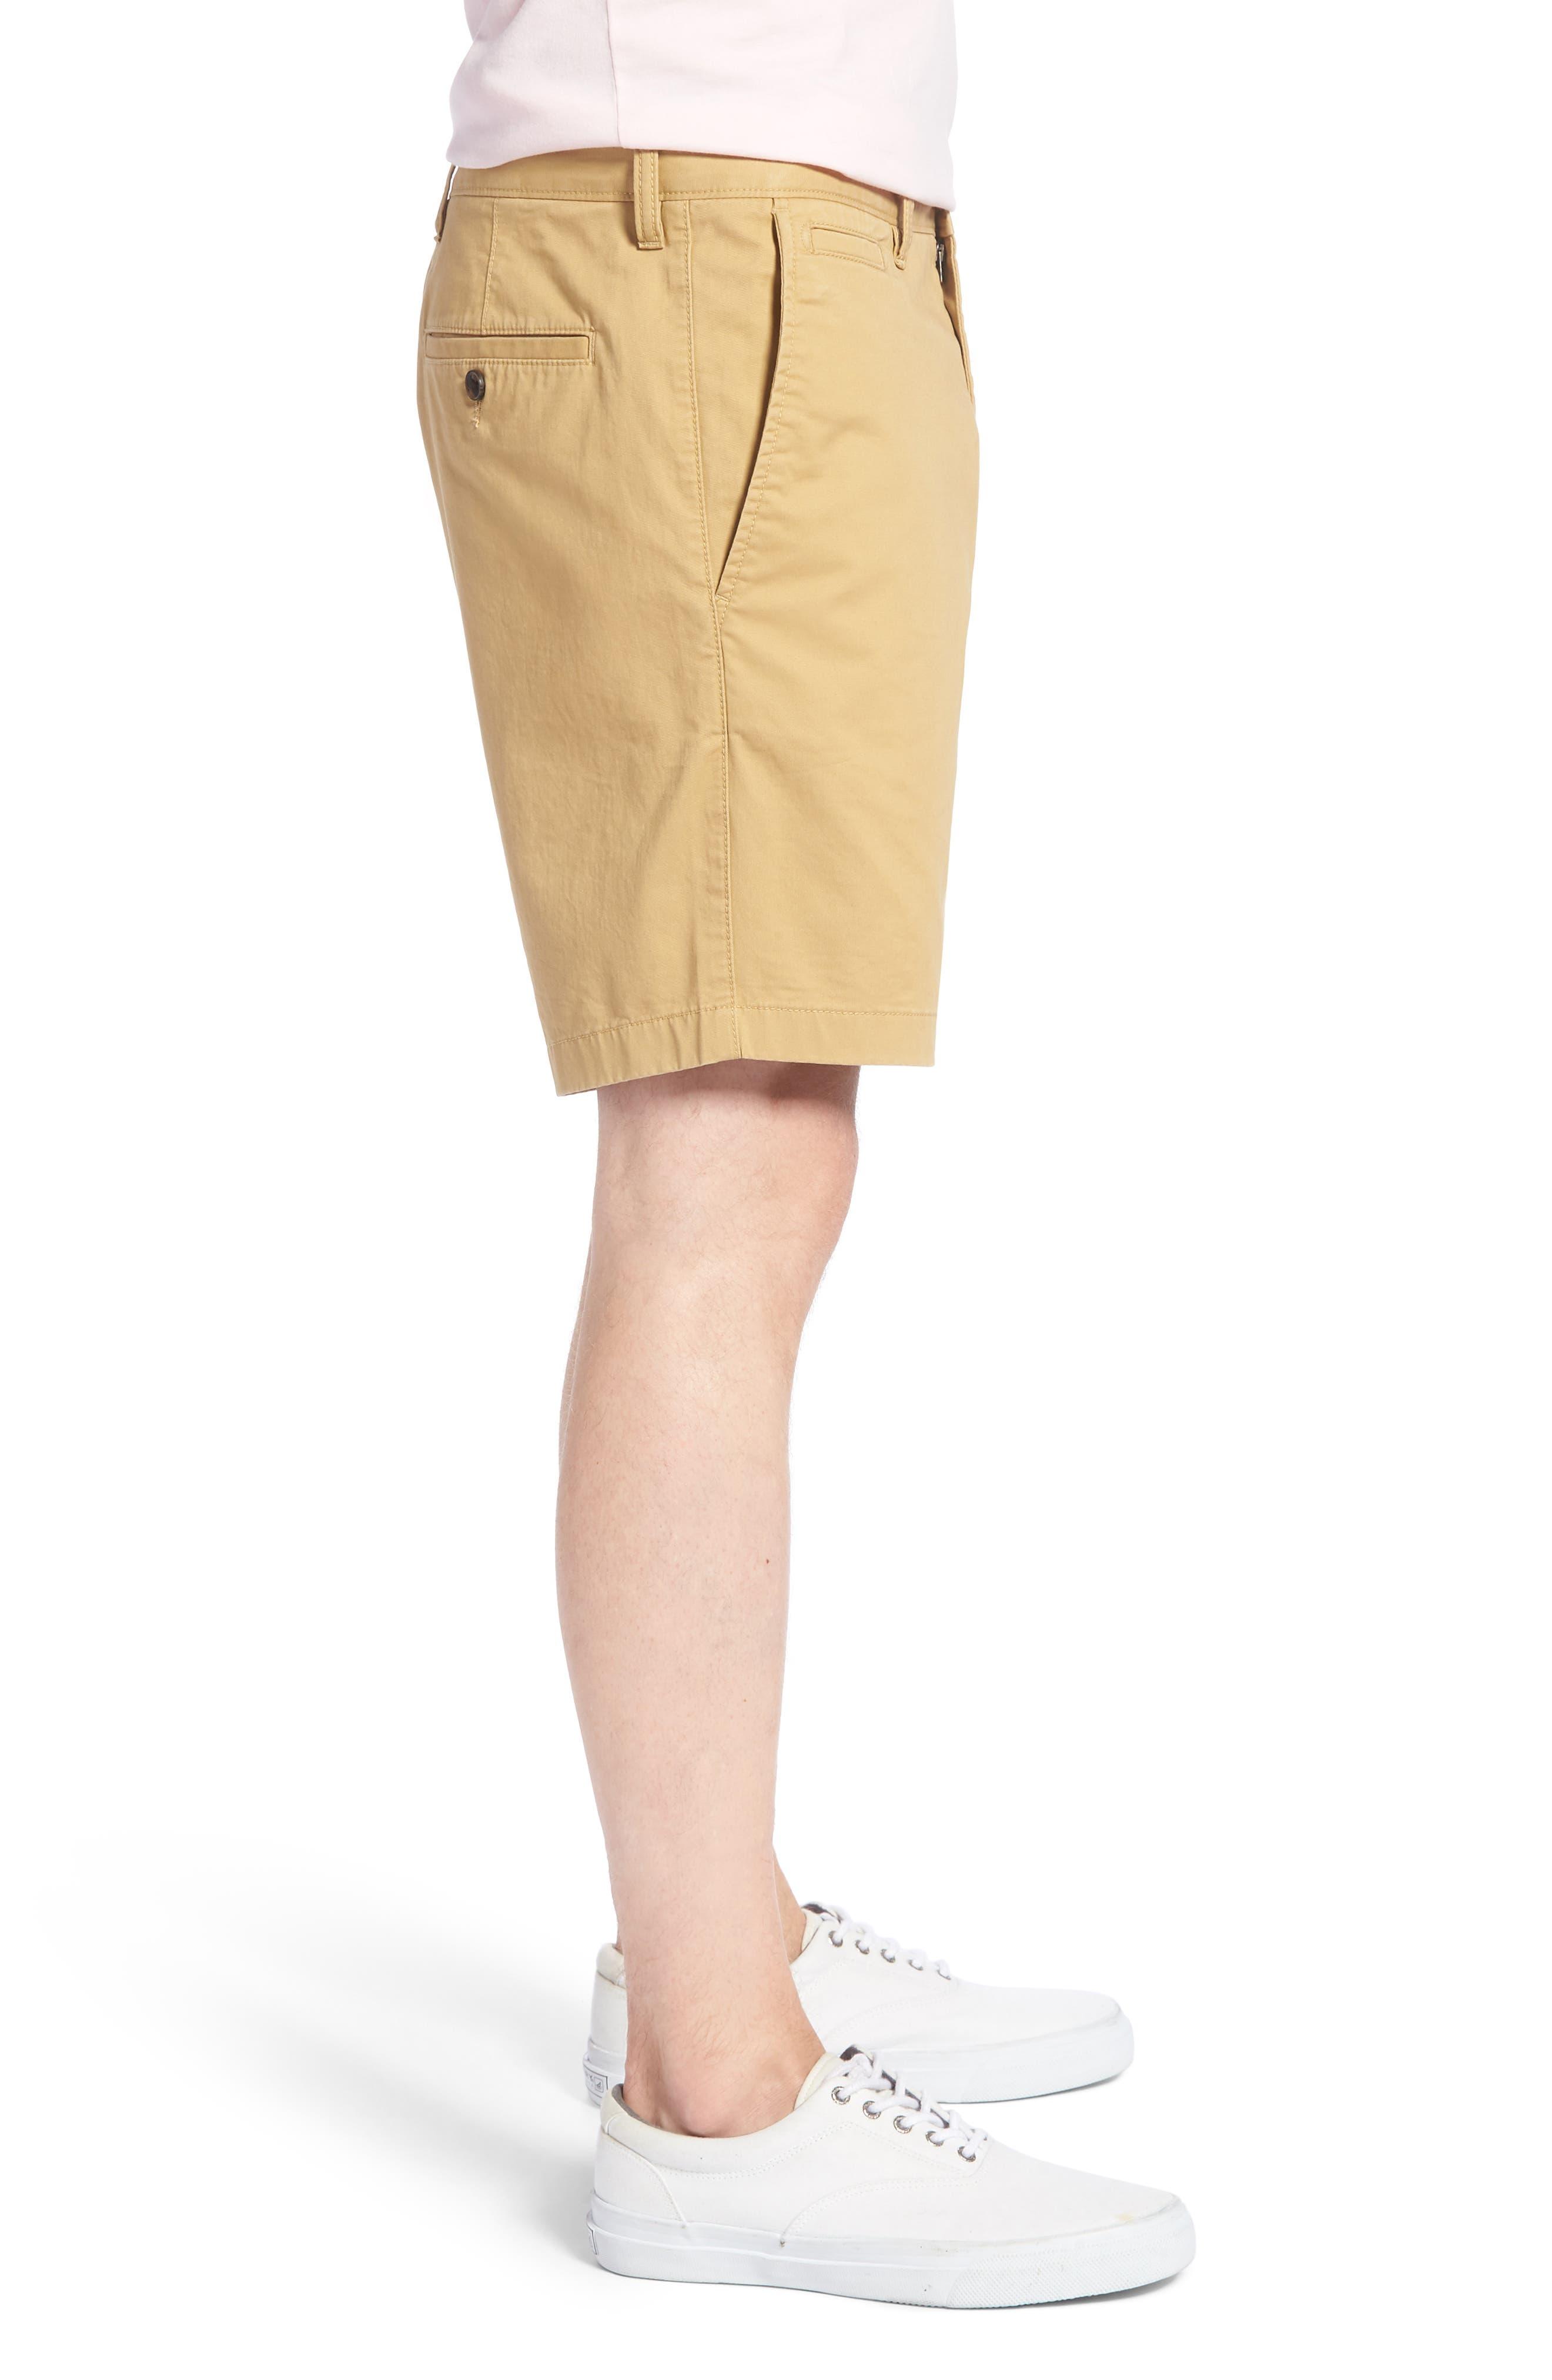 Ballard Slim Fit Stretch Chino 9-Inch Shorts,                             Alternate thumbnail 3, color,                             TAN LARK